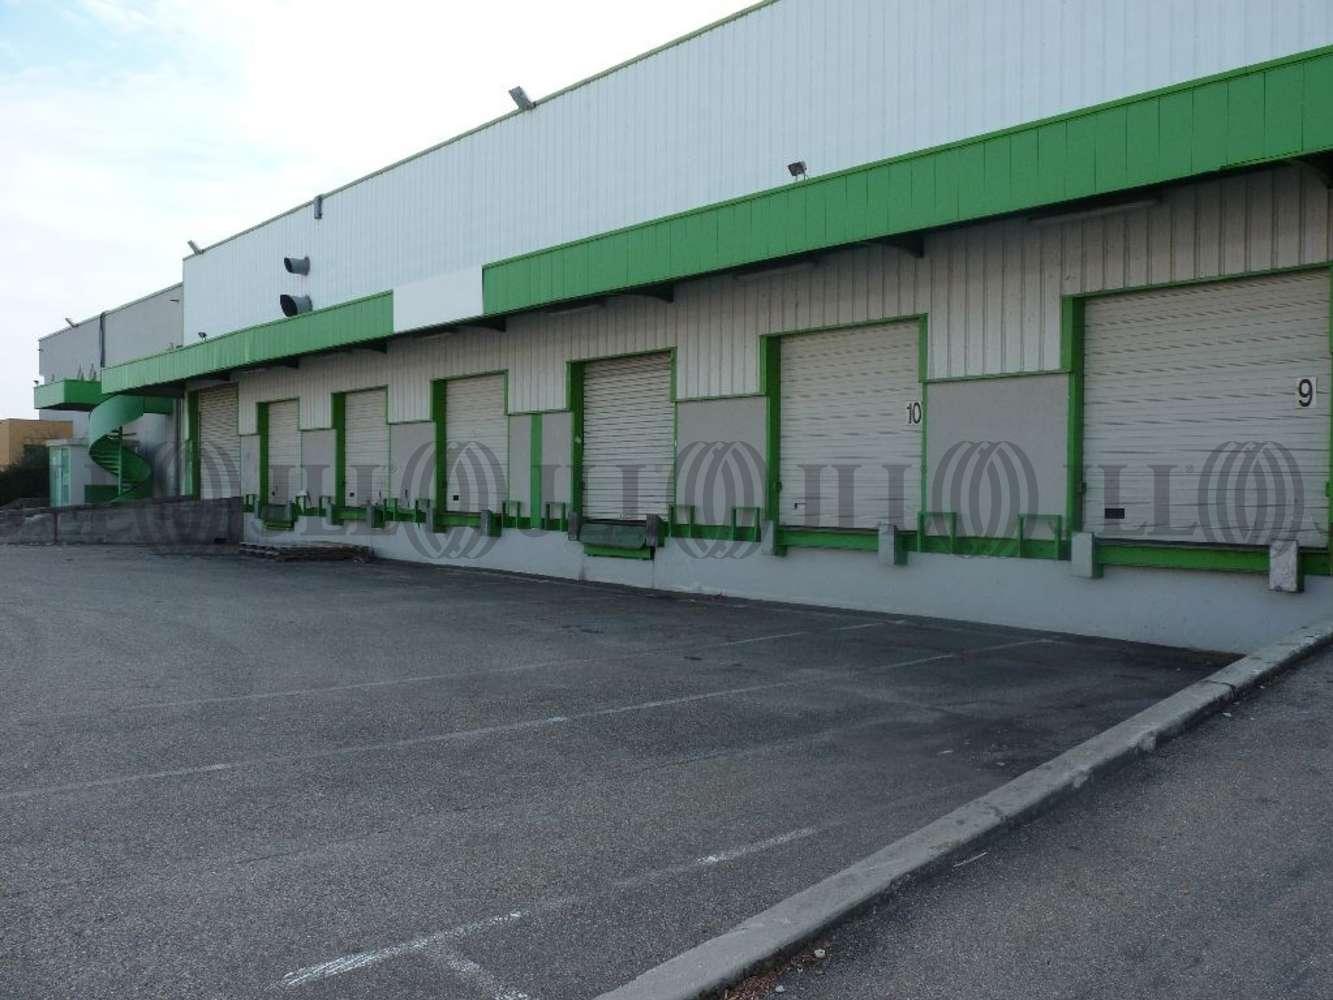 Activités/entrepôt Genas, 69740 - Location entrepot Genas - Lyon Est (69) - 10322577